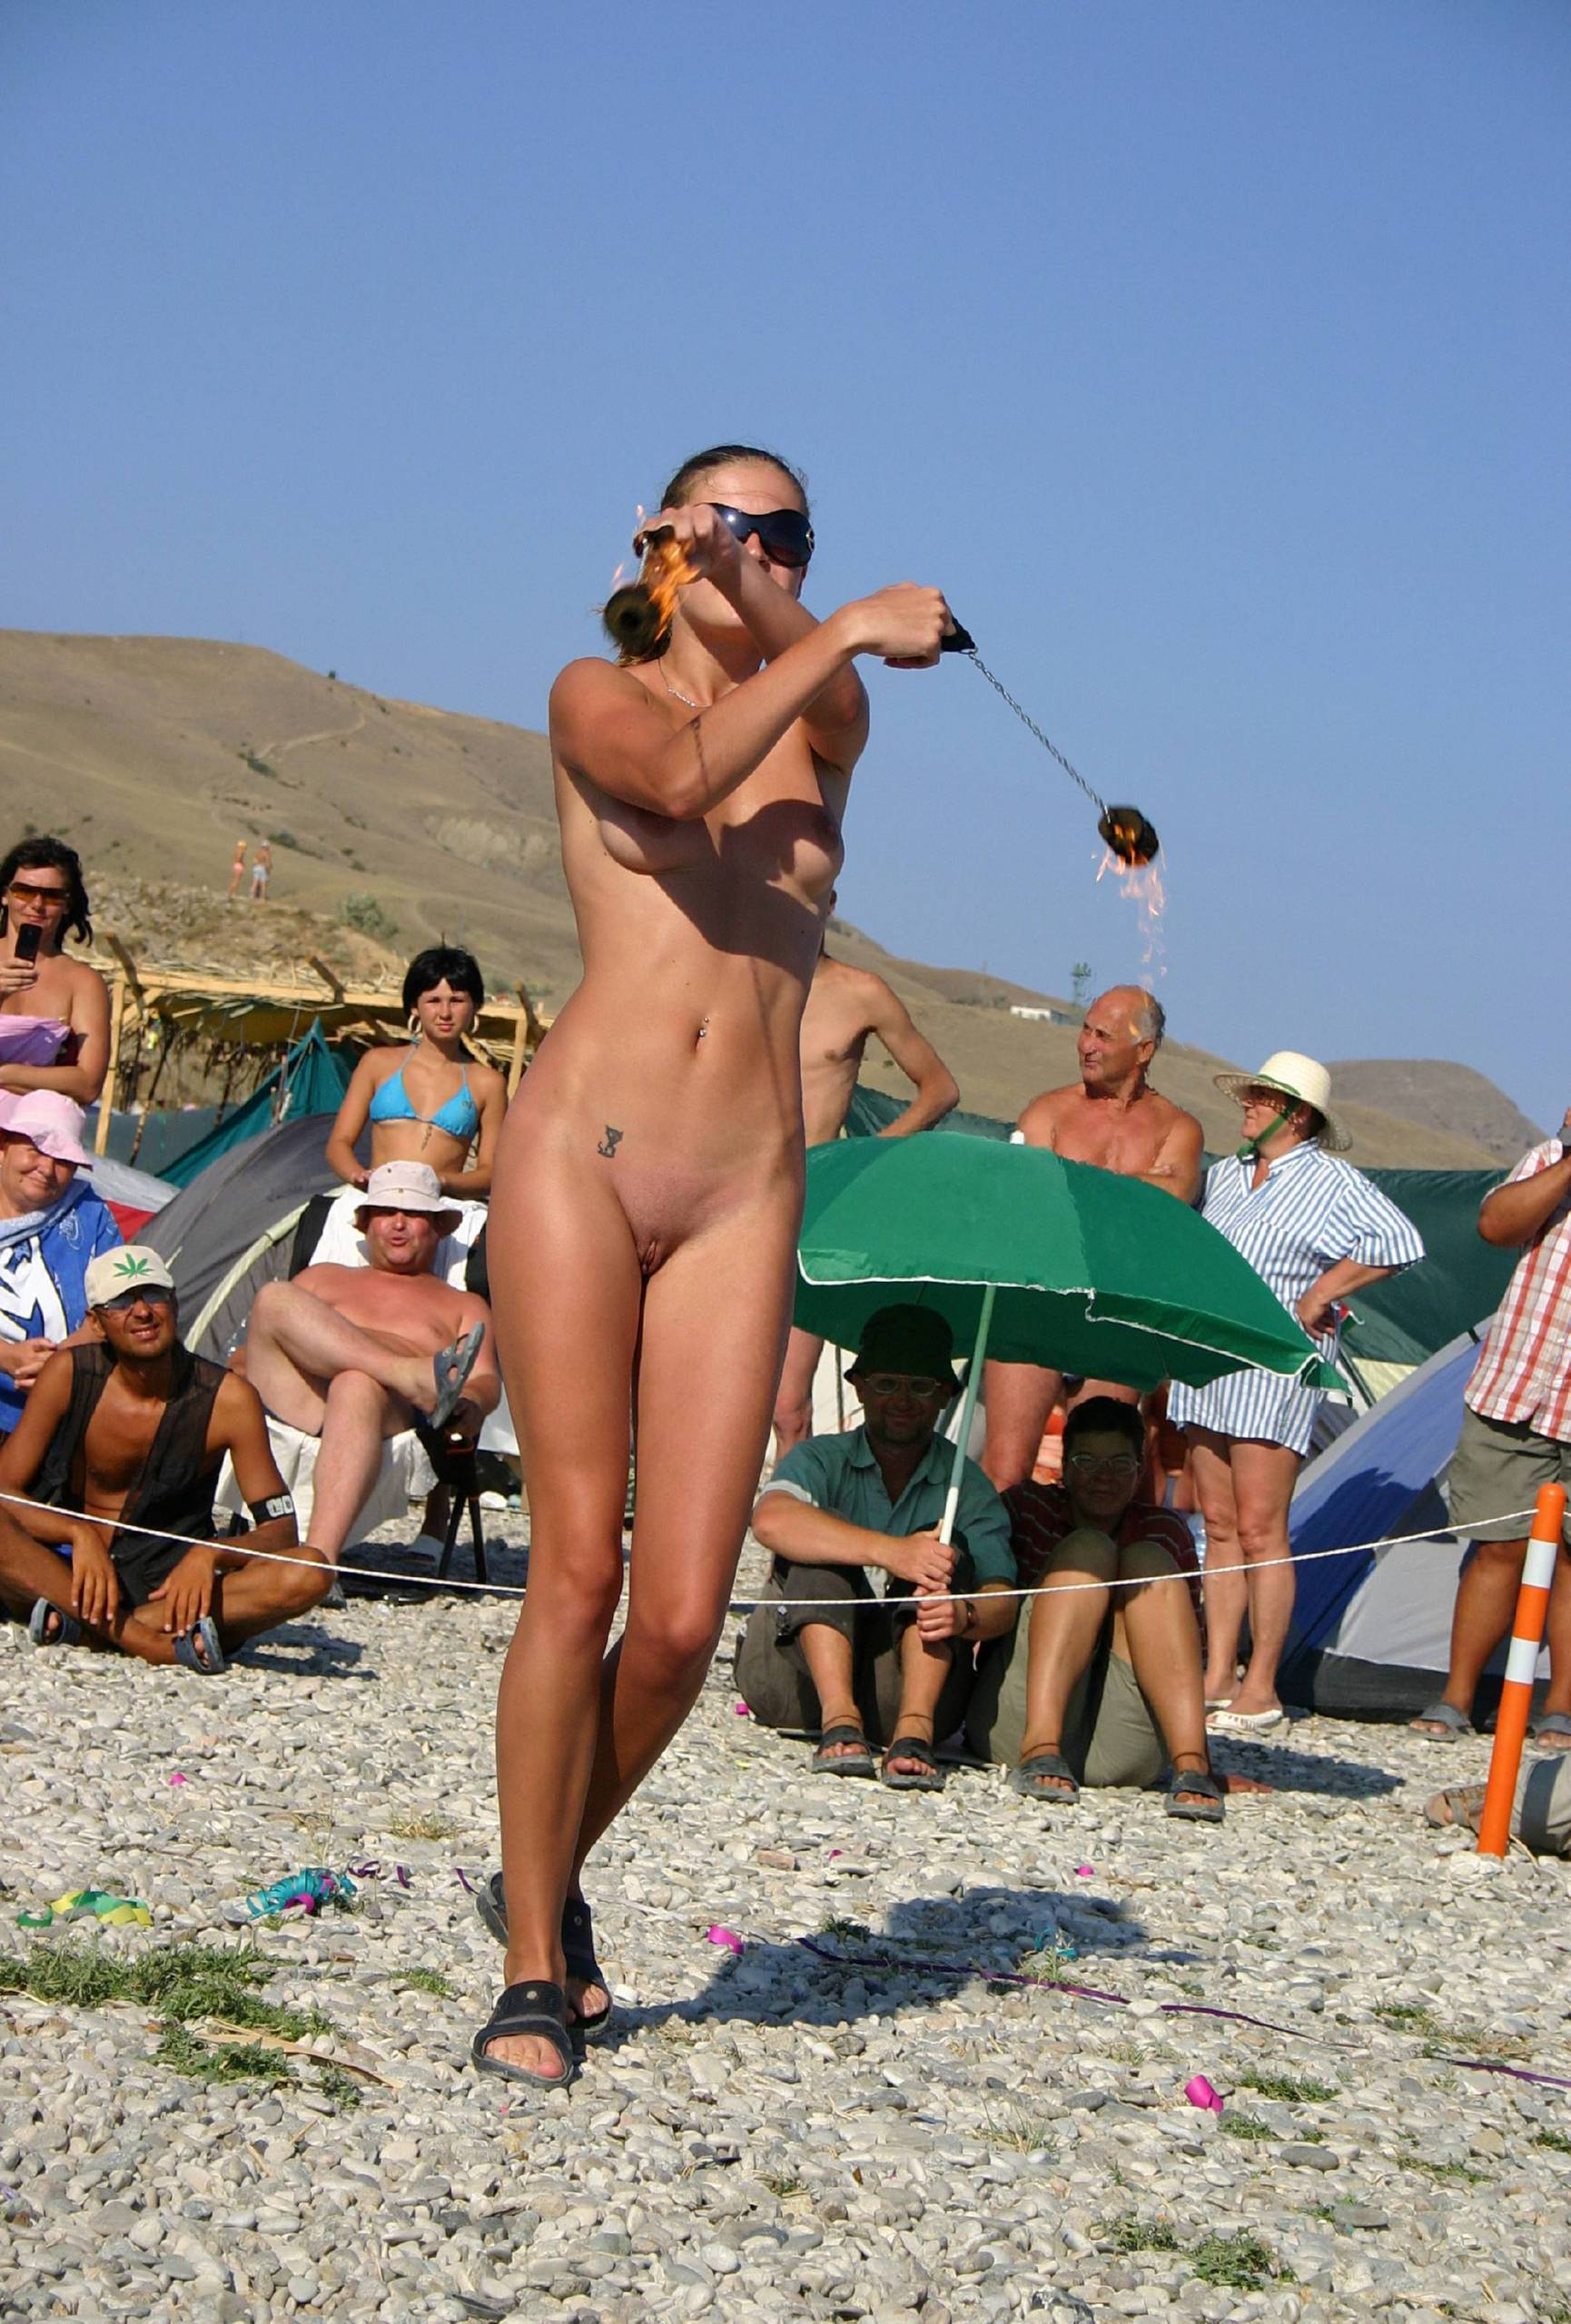 Nudist Gallery Female Fire Ninja Warrior - 1